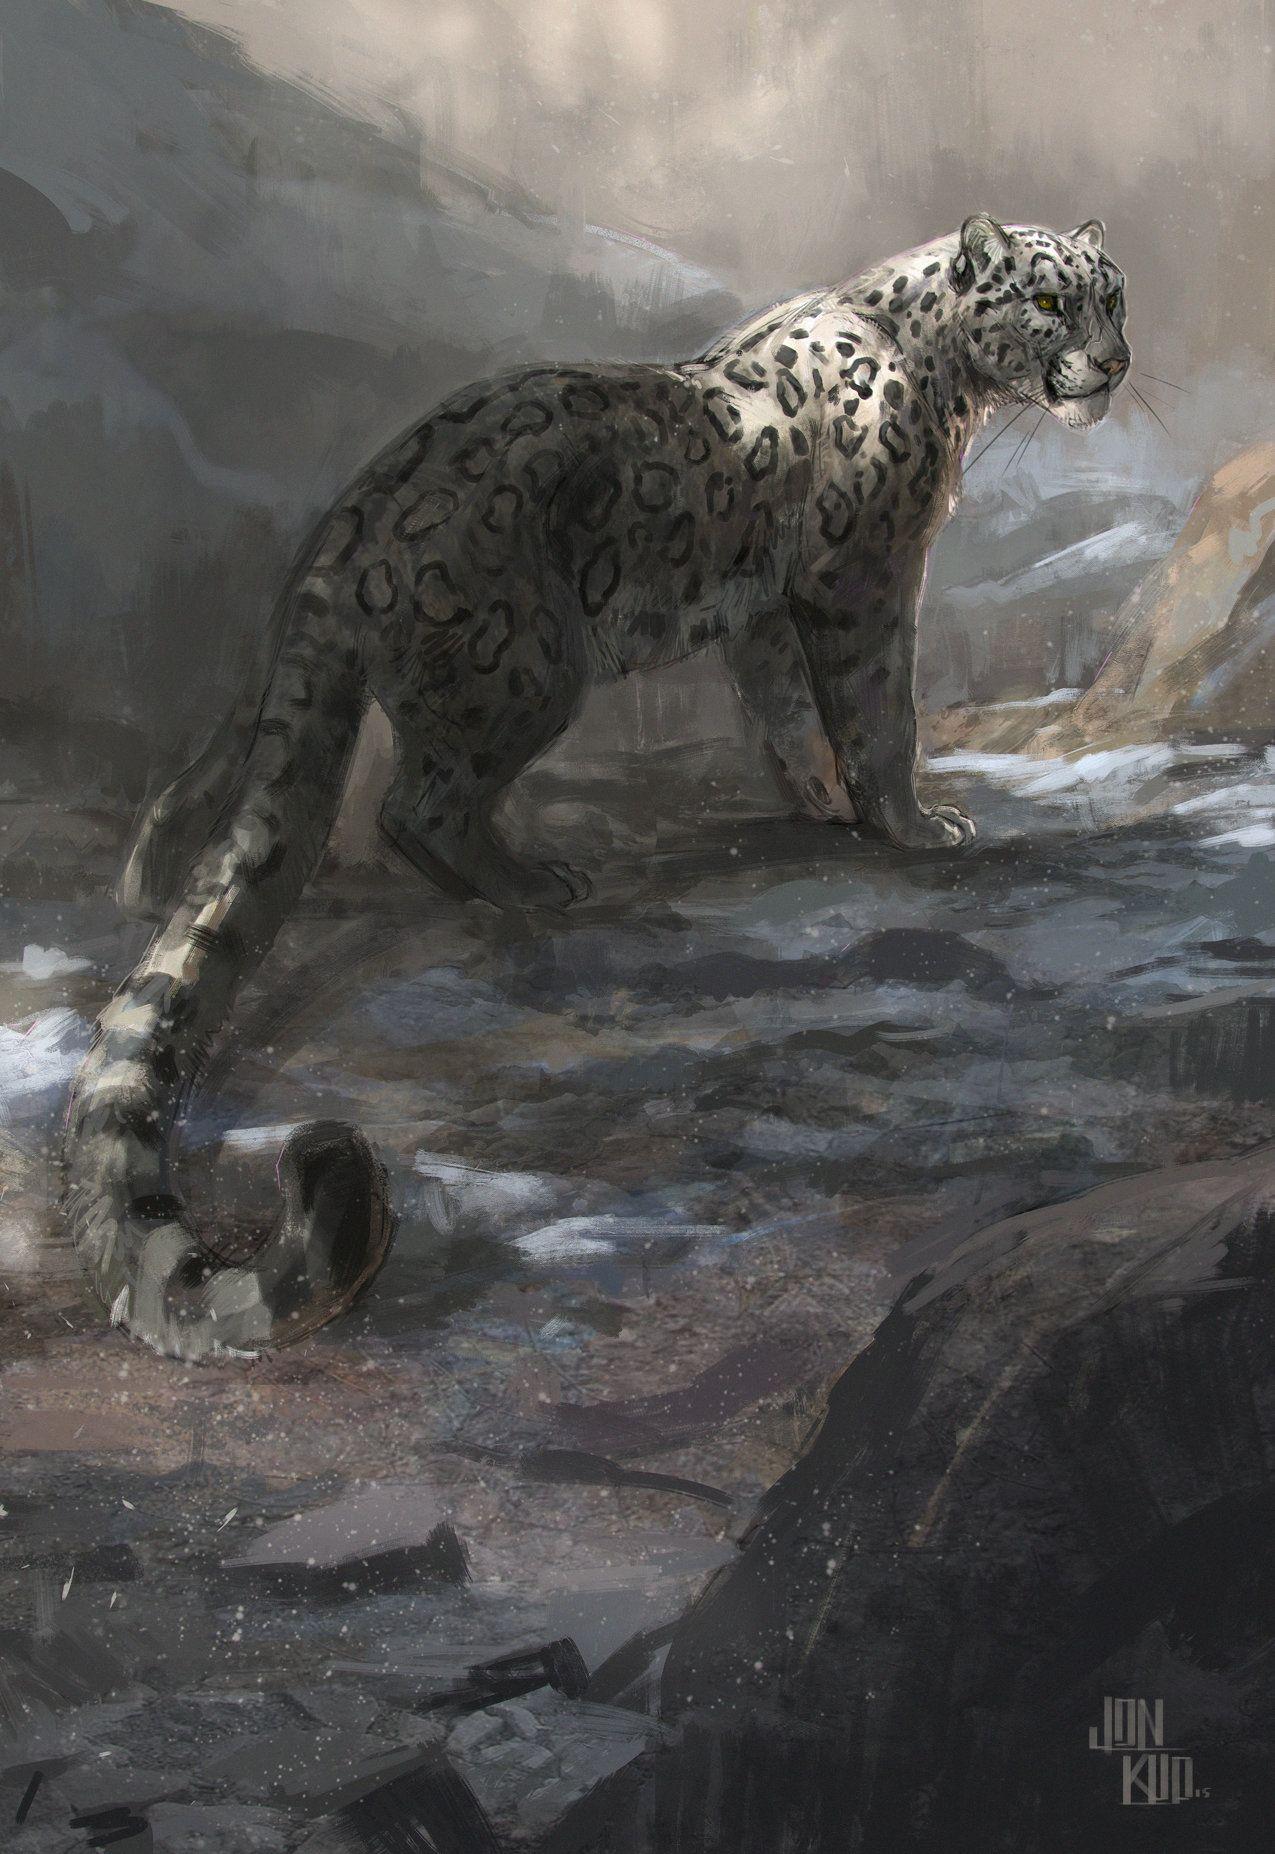 Smilodon Aka Sabertooth And By Jon Kuo On Artstation Big Cats